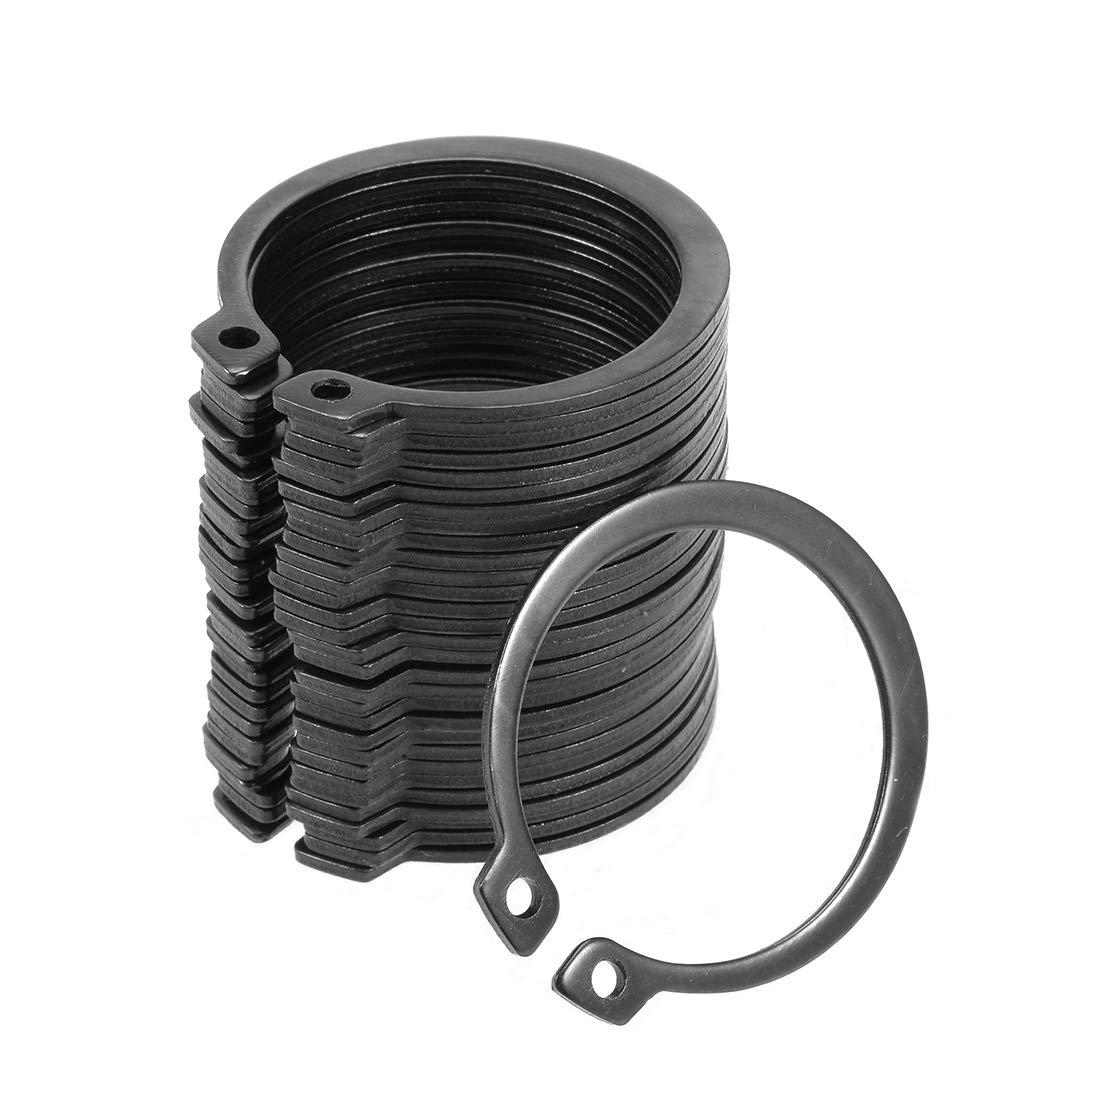 uxcell 38mm External Circlips C-Clip Retaining Shaft Snap Rings 50Mn 30pcs